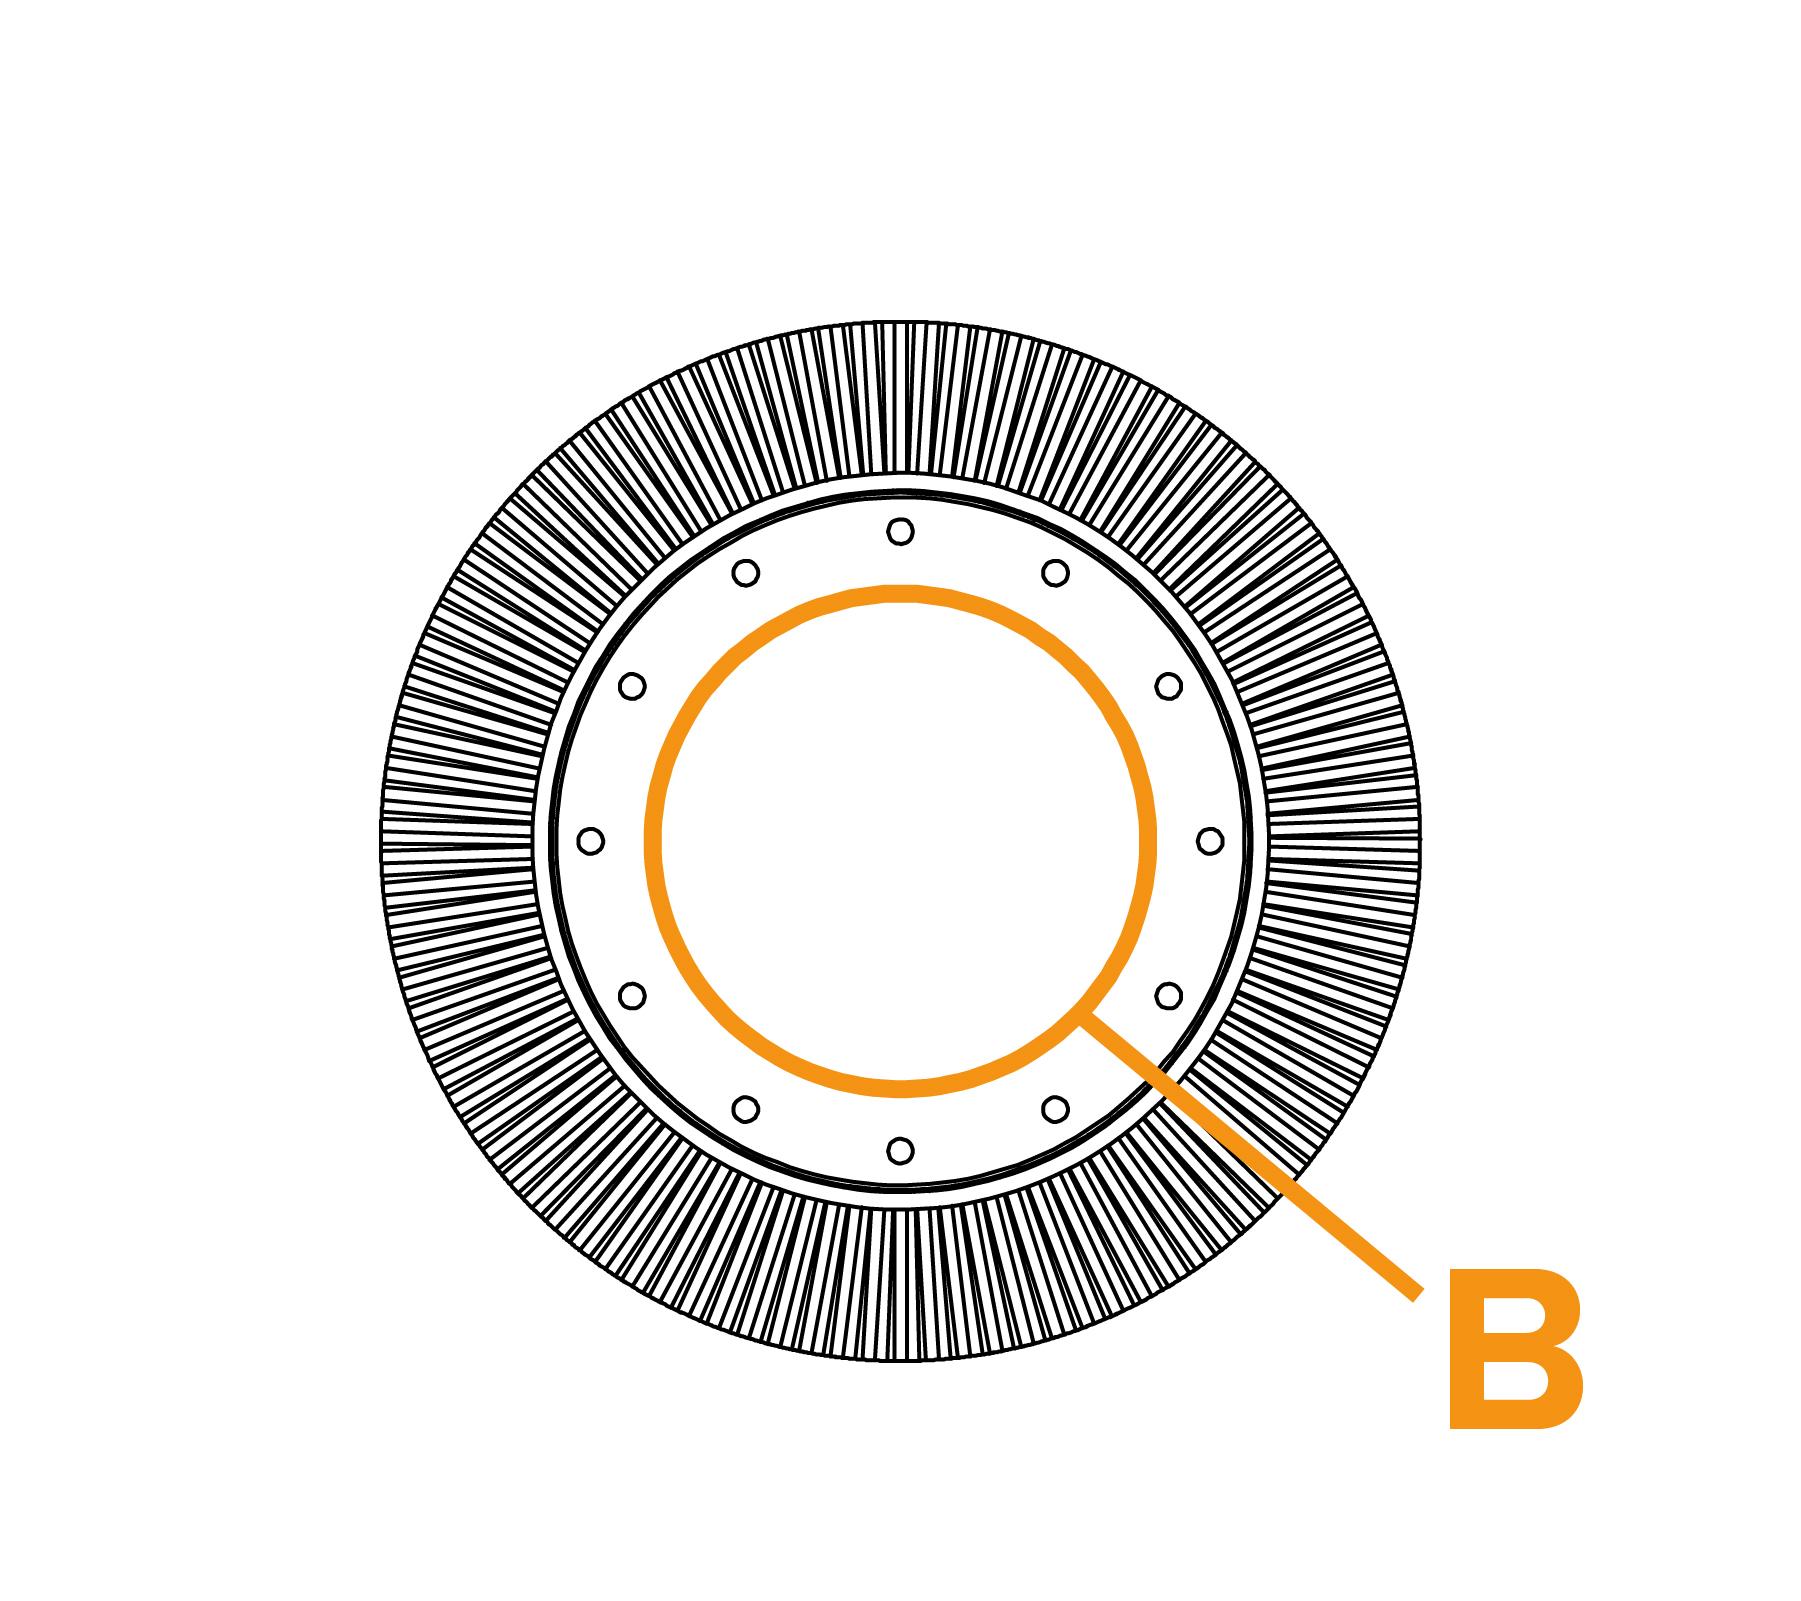 Potloodringborstel met grote diameter - diagram B